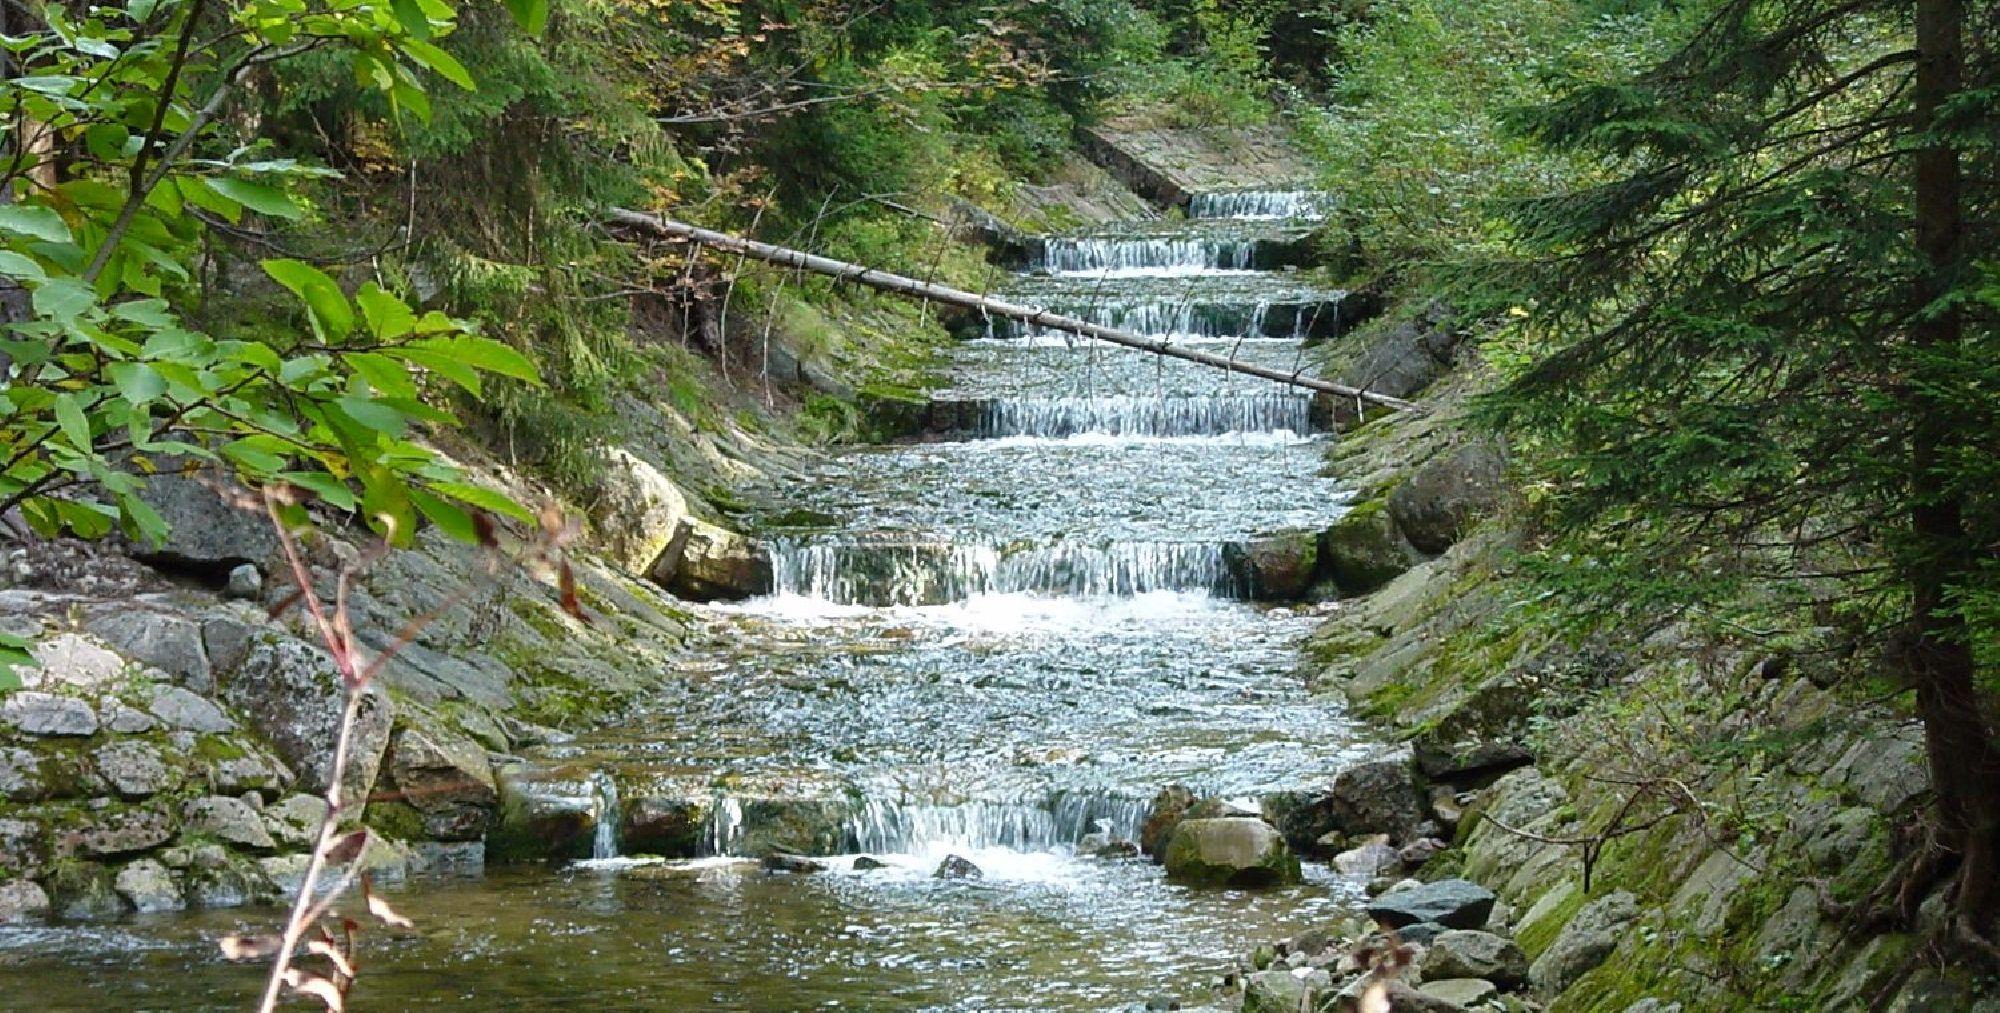 Bach im Riesengebirge